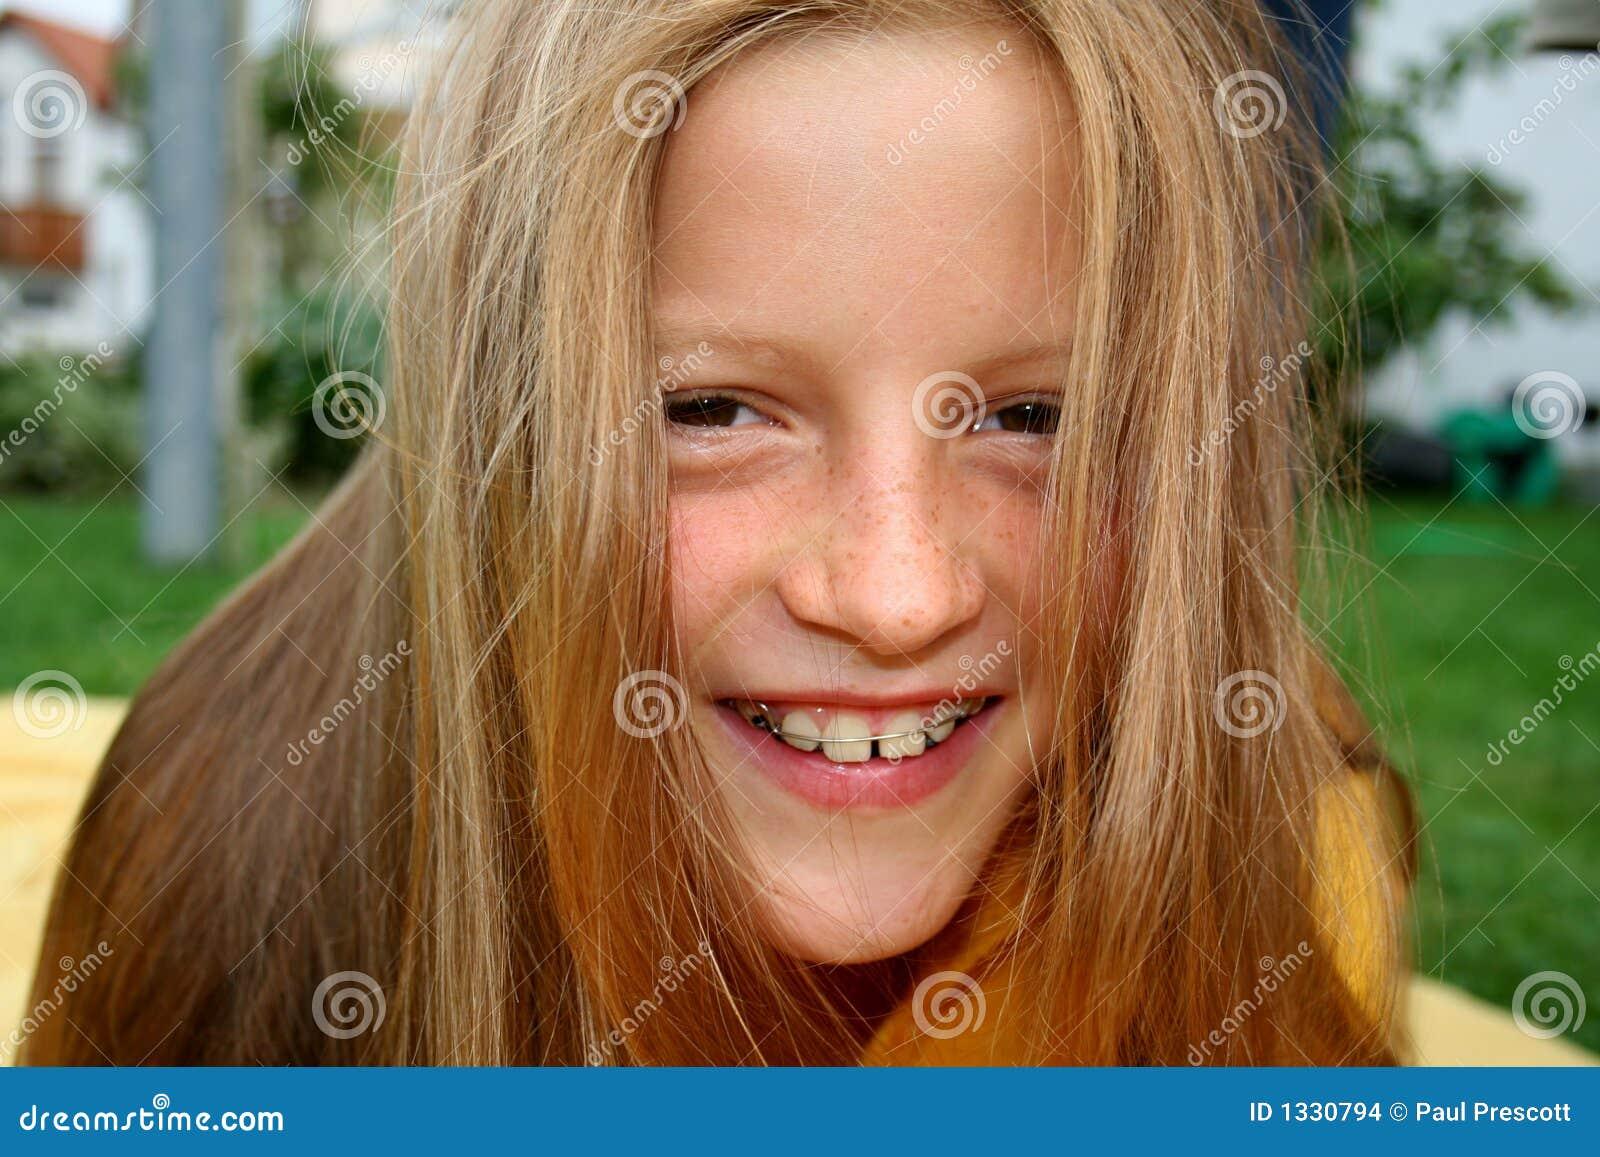 Teen fap young model bild